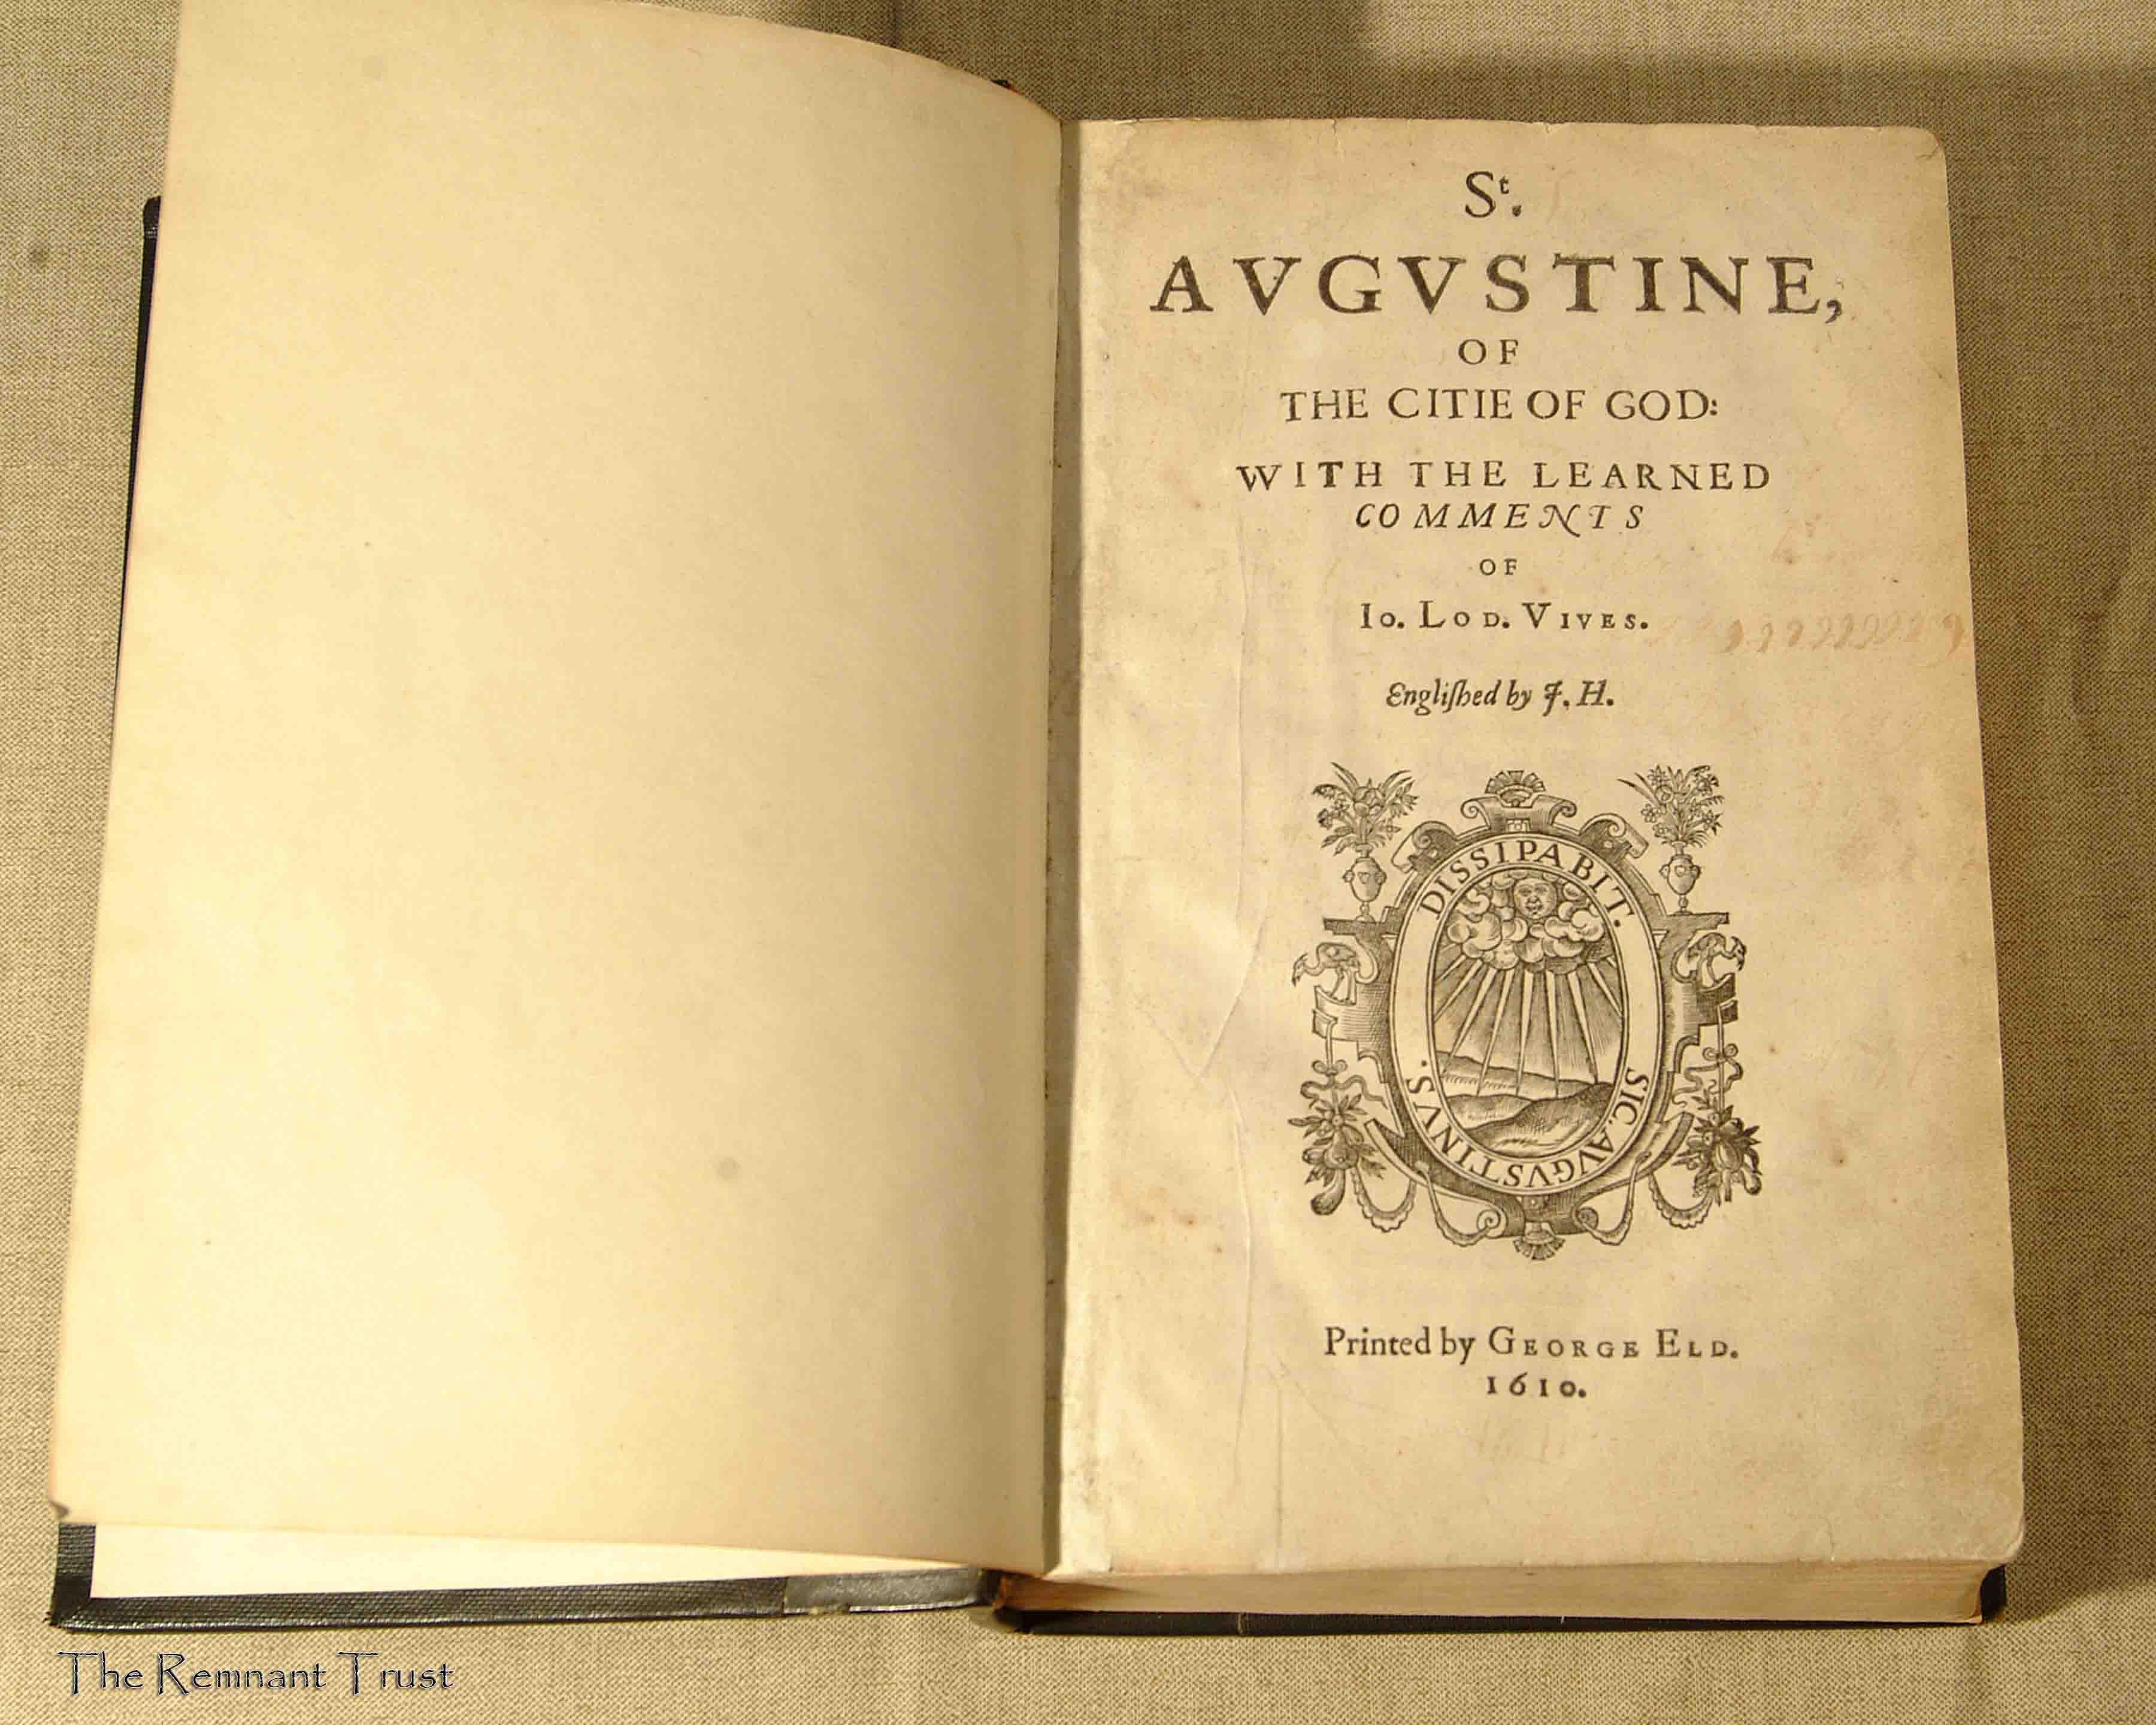 029-Augustine-Title-Page-copy